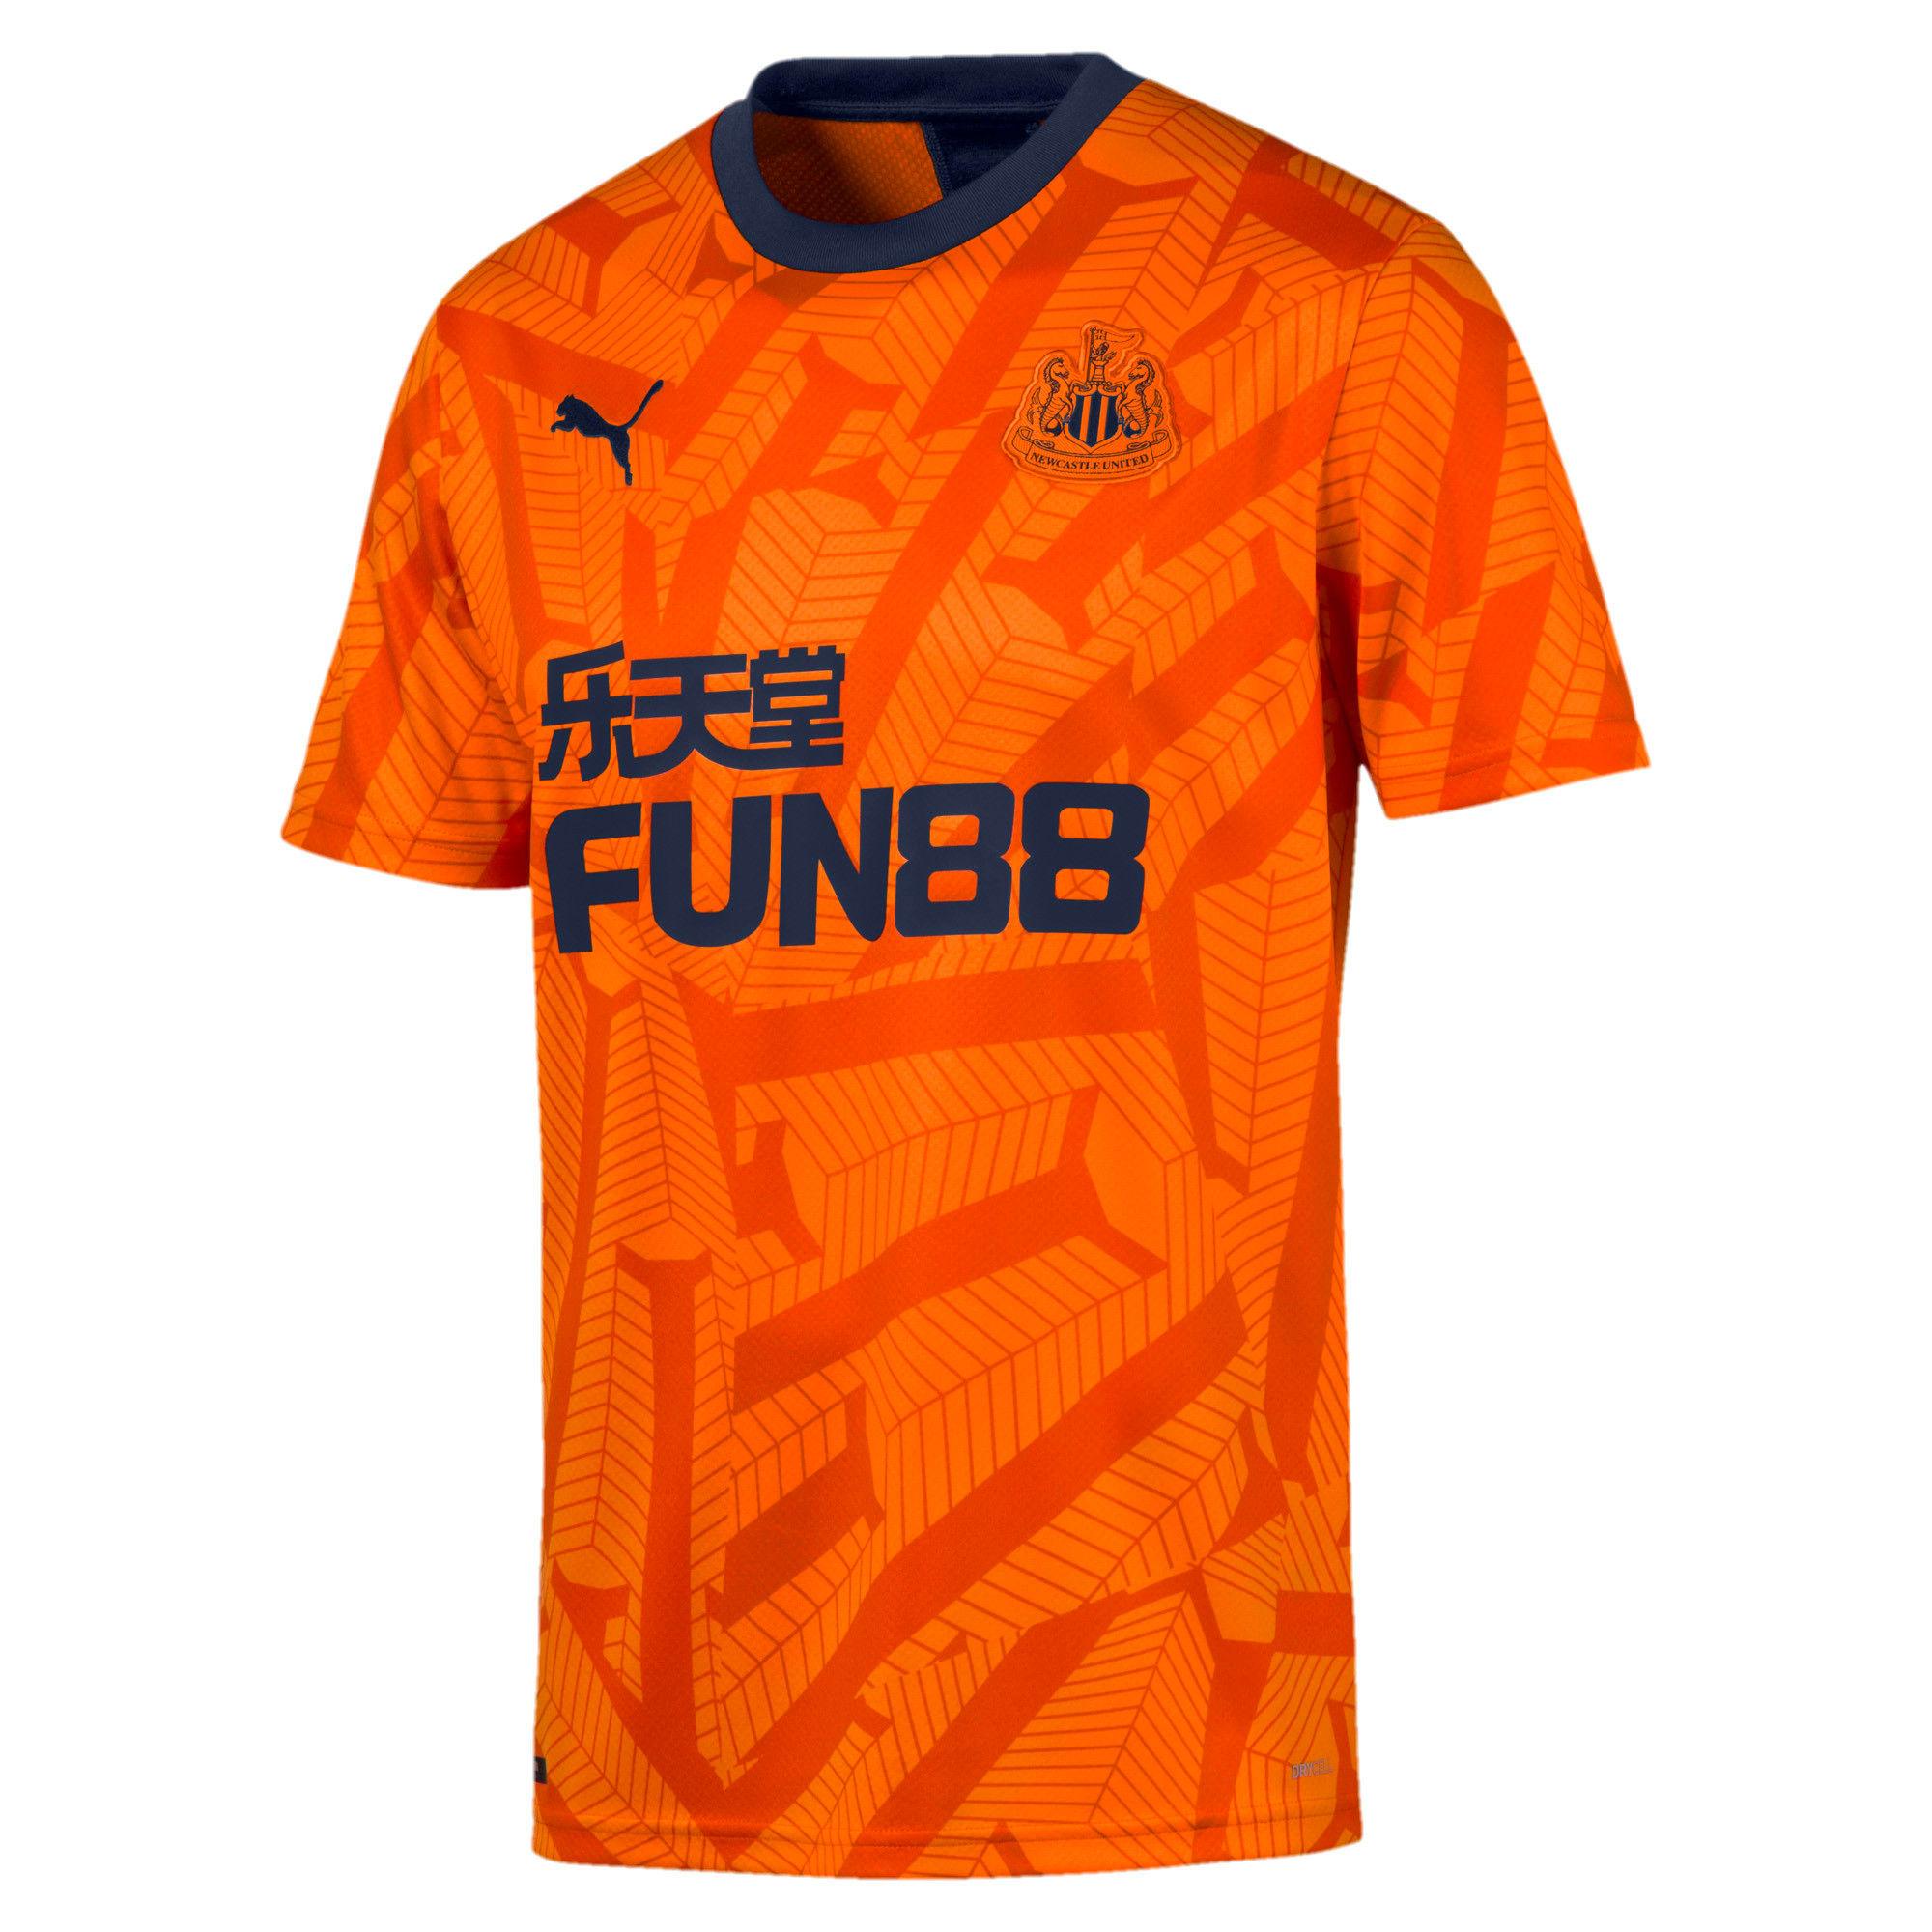 Thumbnail 1 of Newcastle United FC Men's Third Replica Short Sleeve Jersey, Vibrant Orange-Peacoat, medium